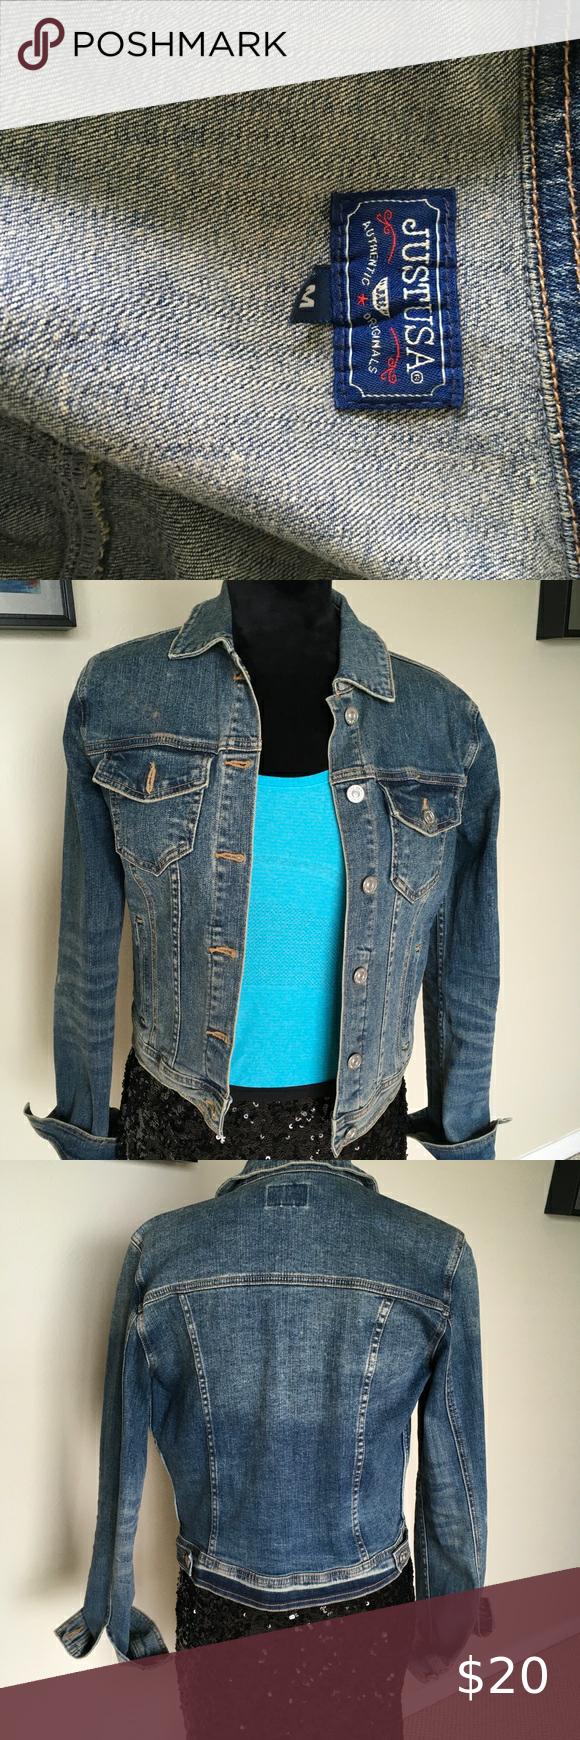 2 For 30 Mix Match Justusa Cropped Denim Jacket Denim Jacket Cropped Denim Cropped Denim Jacket [ 1740 x 580 Pixel ]